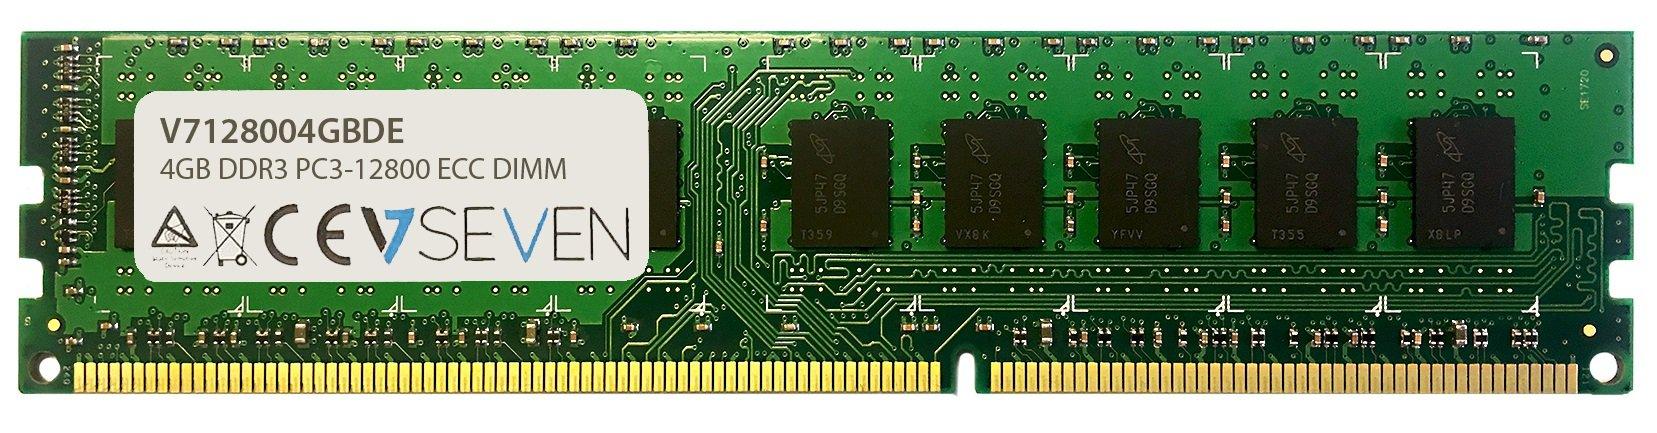 Memoria RAM 4GB V7 V712800 DE 4GB DDR3 1600MHZ CL11 ECC ECC DIMM PC3-12800 1.5V Internal